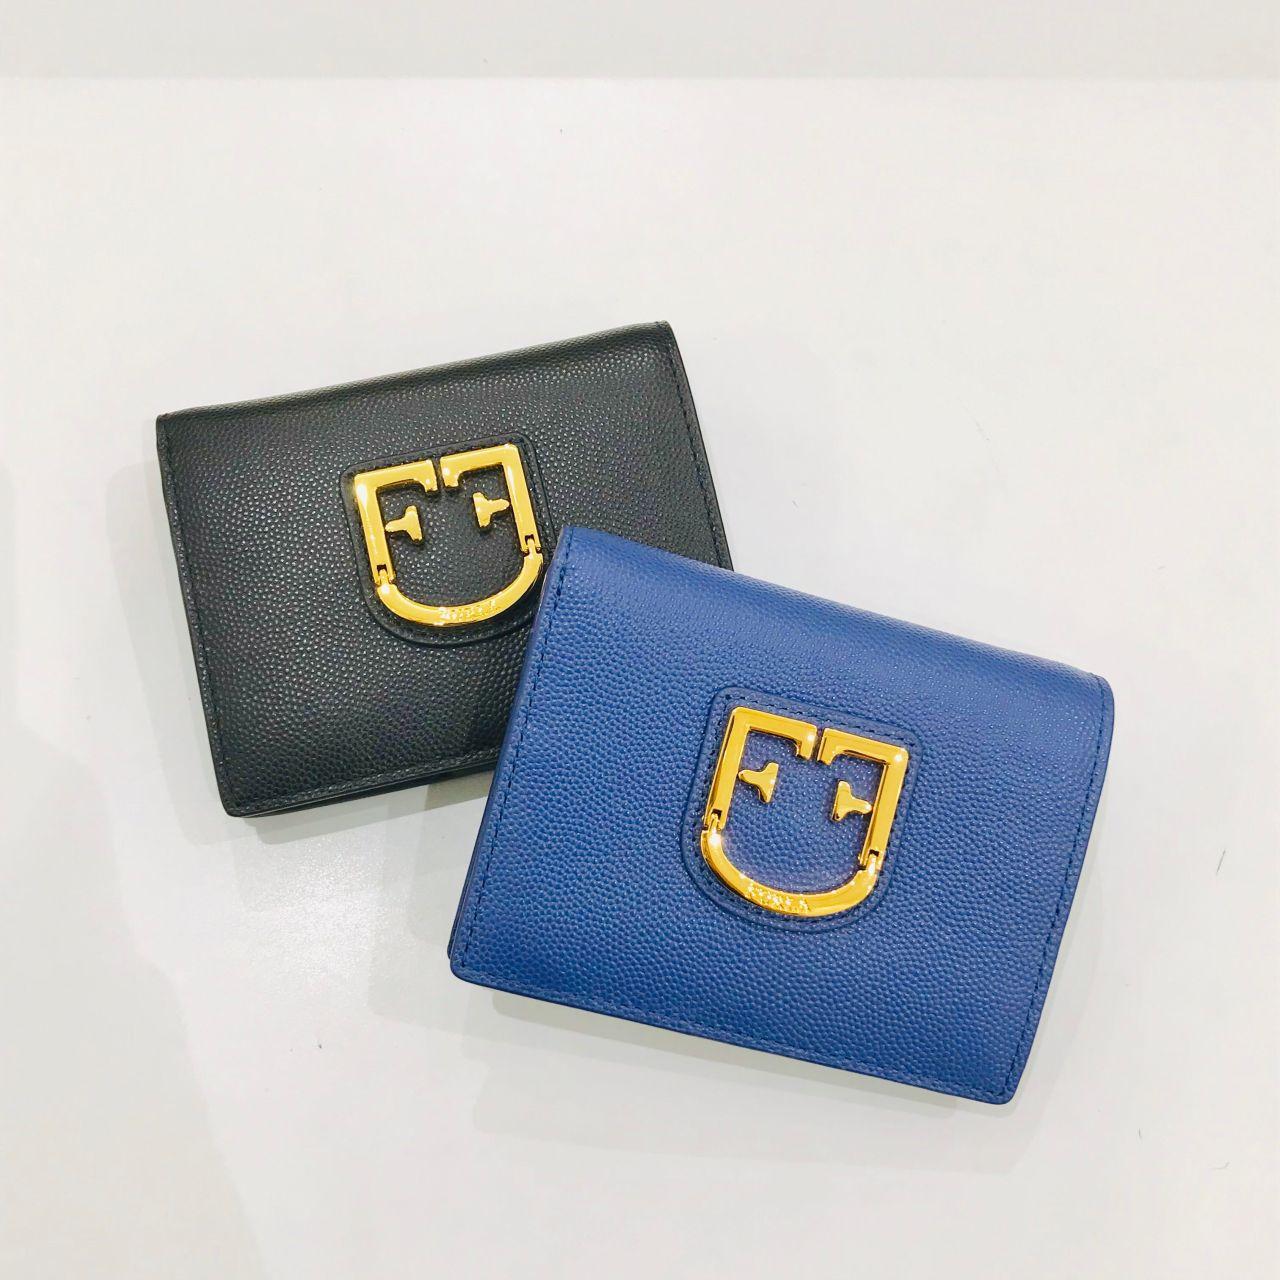 on sale 5134d 629ca 2019秋冬新作【FURLA ミニ財布】 | 静岡店 | フィットハウス公式 ...